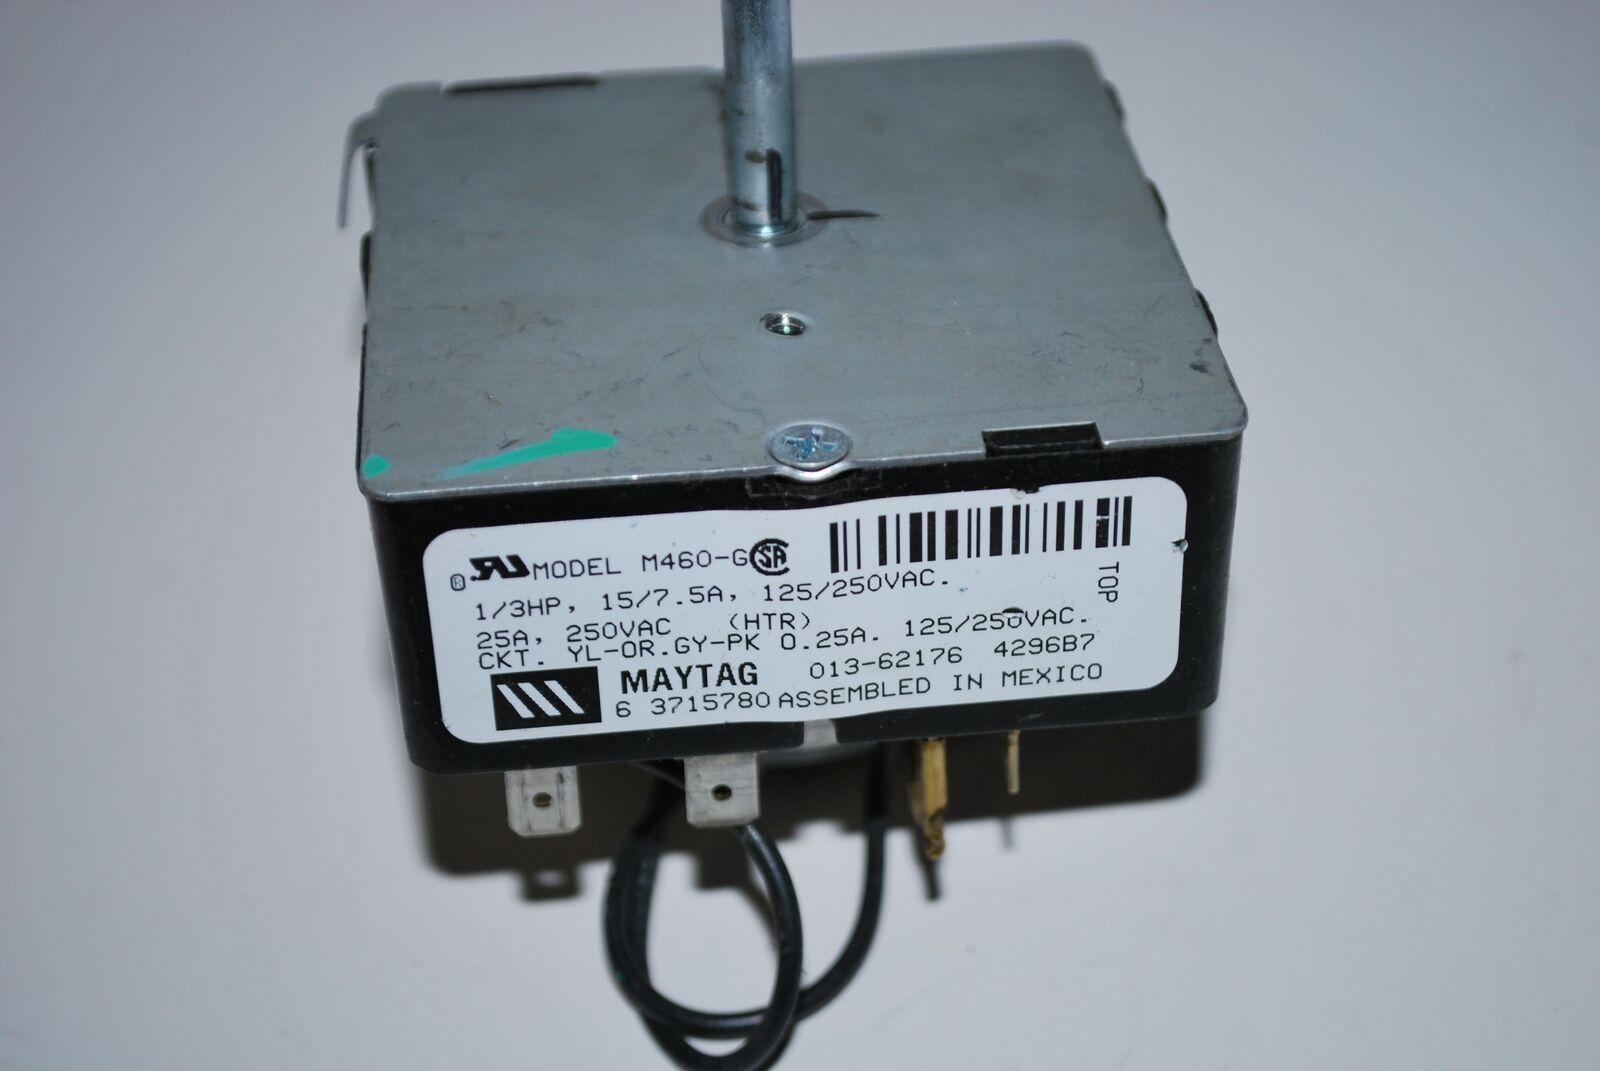 30 Day Warranty MAYTAG Dryer Timer 6 3715780